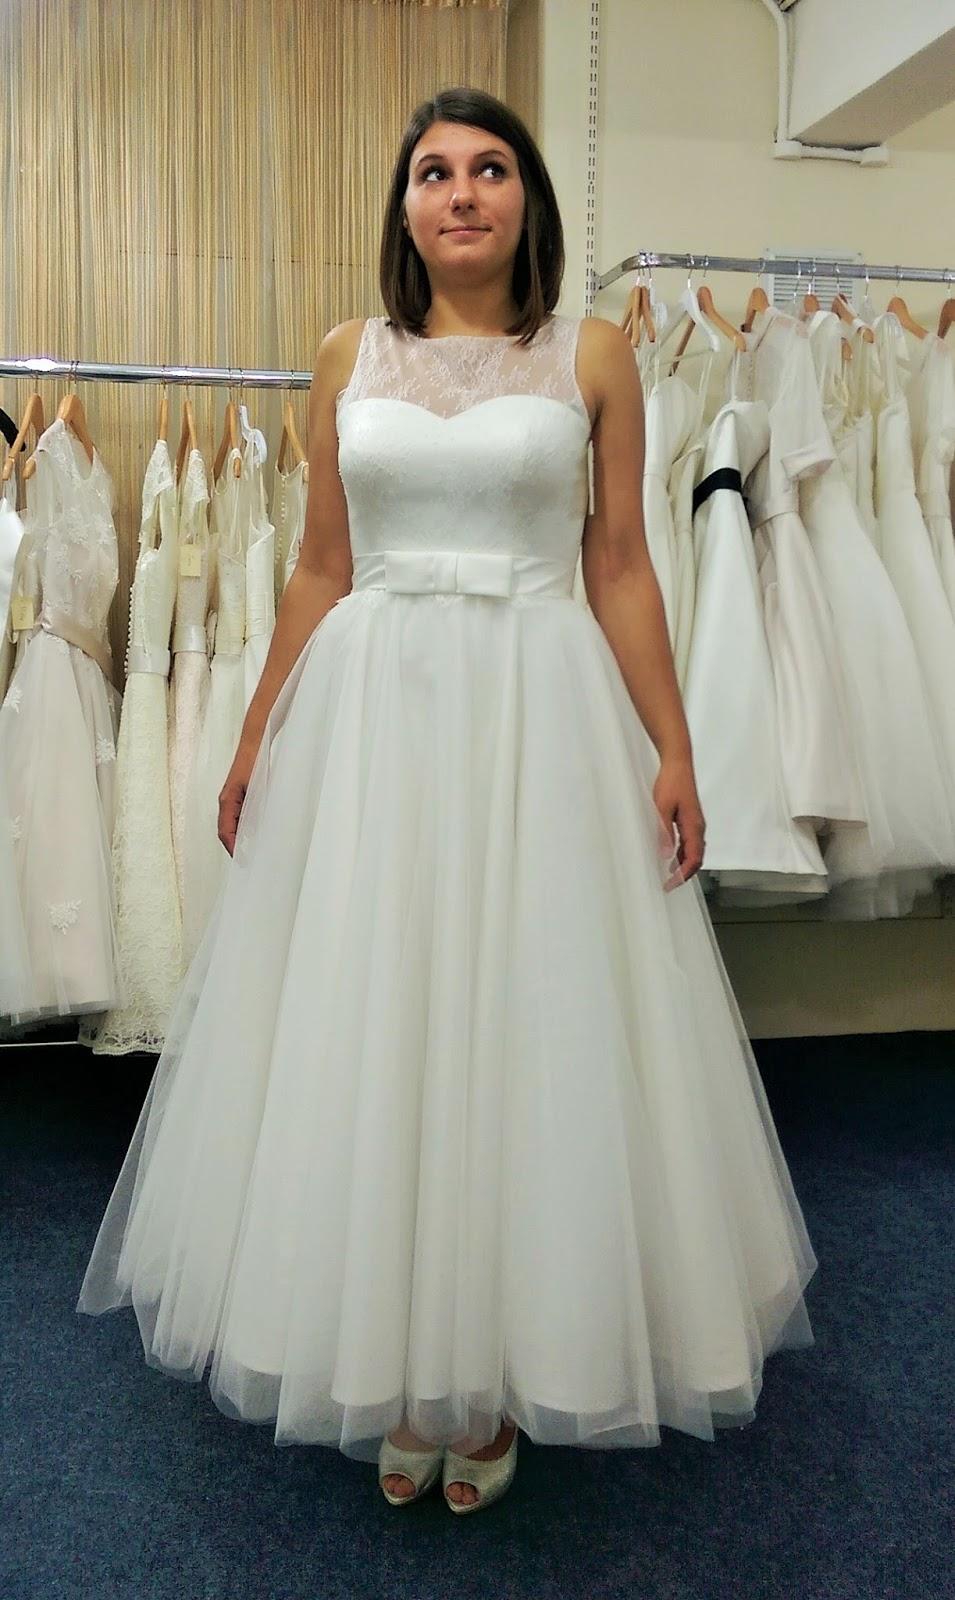 Emily Kate Makes...: Operation Wedding Dress - Stage 2